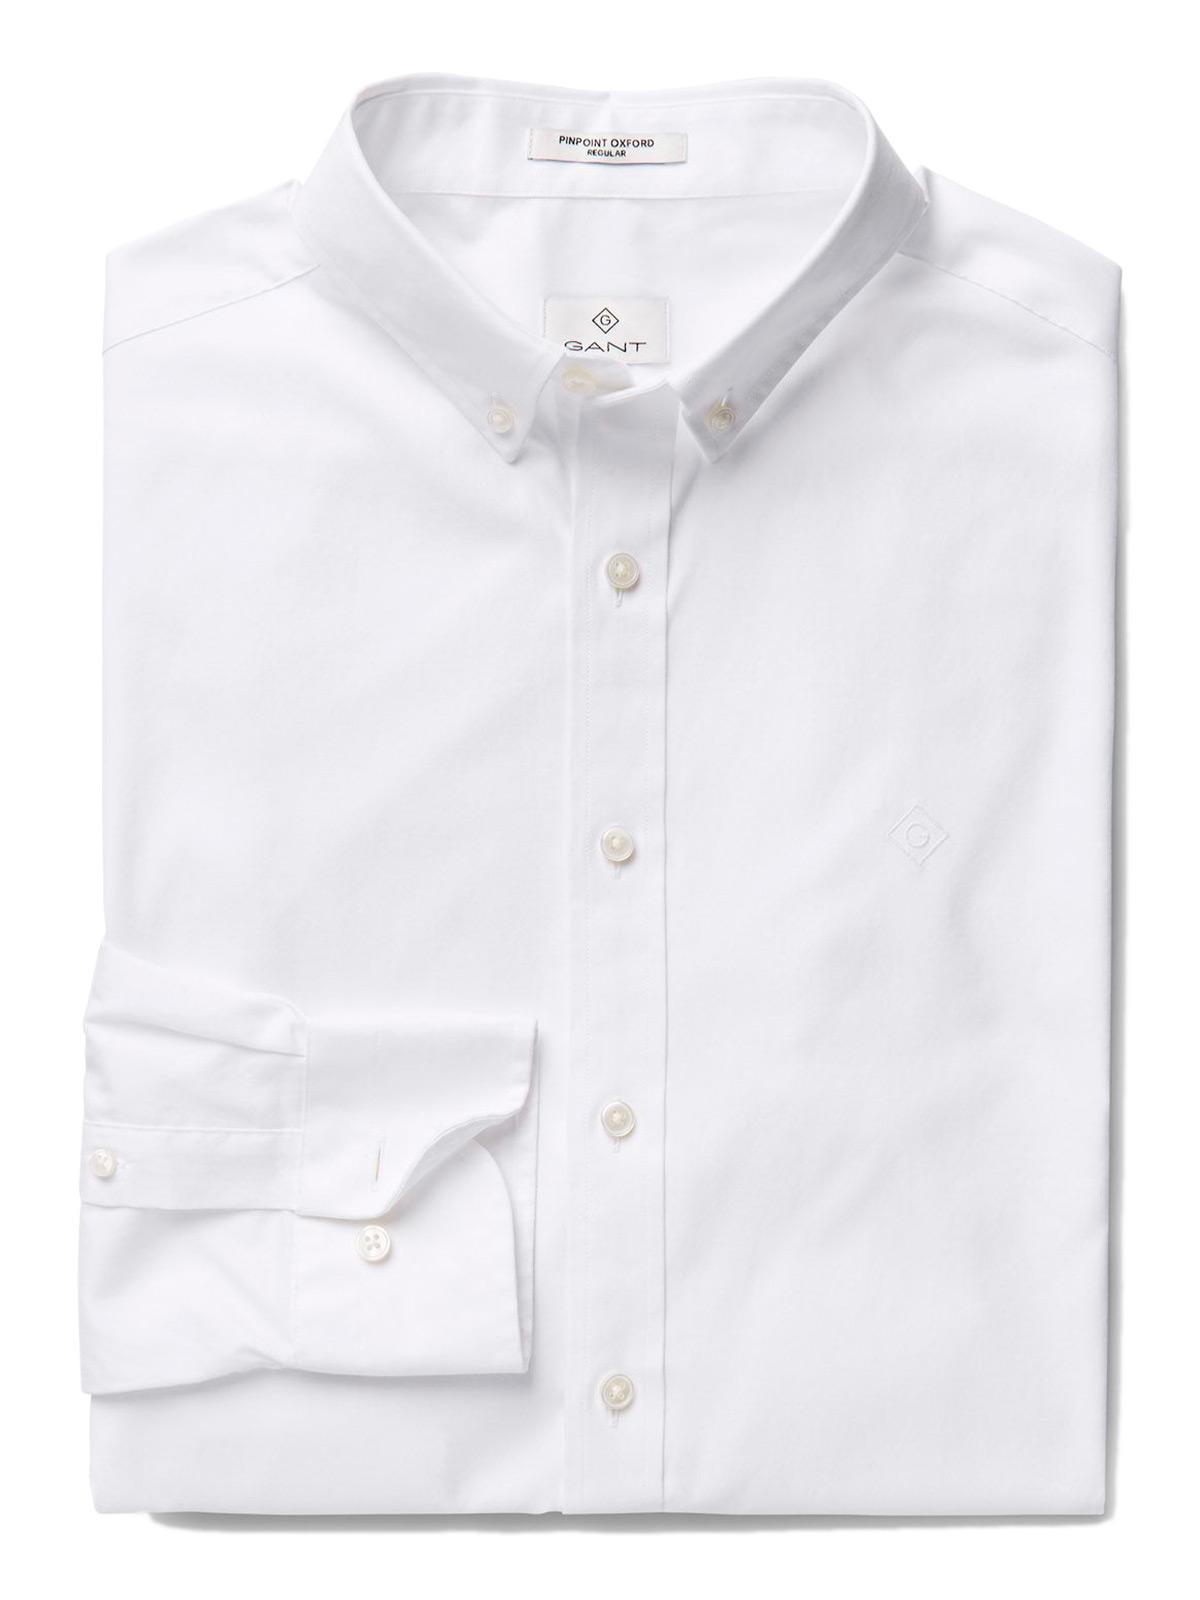 0b8334cb4f GANT Men's Pinpoint Oxford Shirt Regular 110 | 1803.303000 | Botta ...